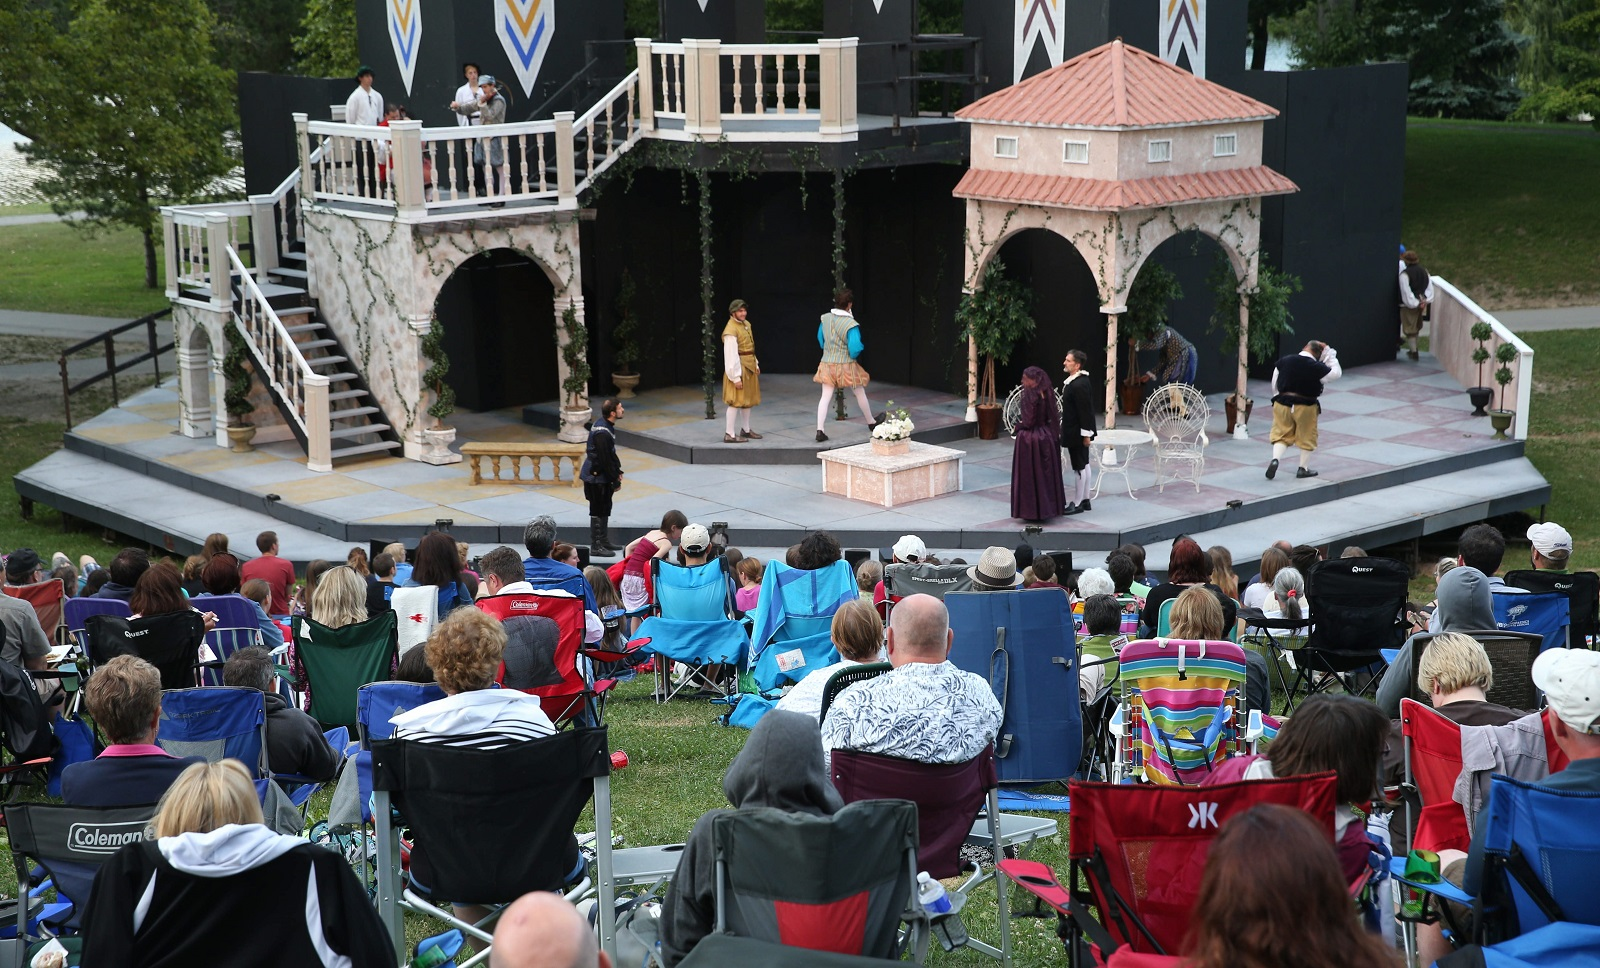 Shakespeare in Delaware Park is preparing for a new season. (Sharon Cantillon/Buffalo News file photo)